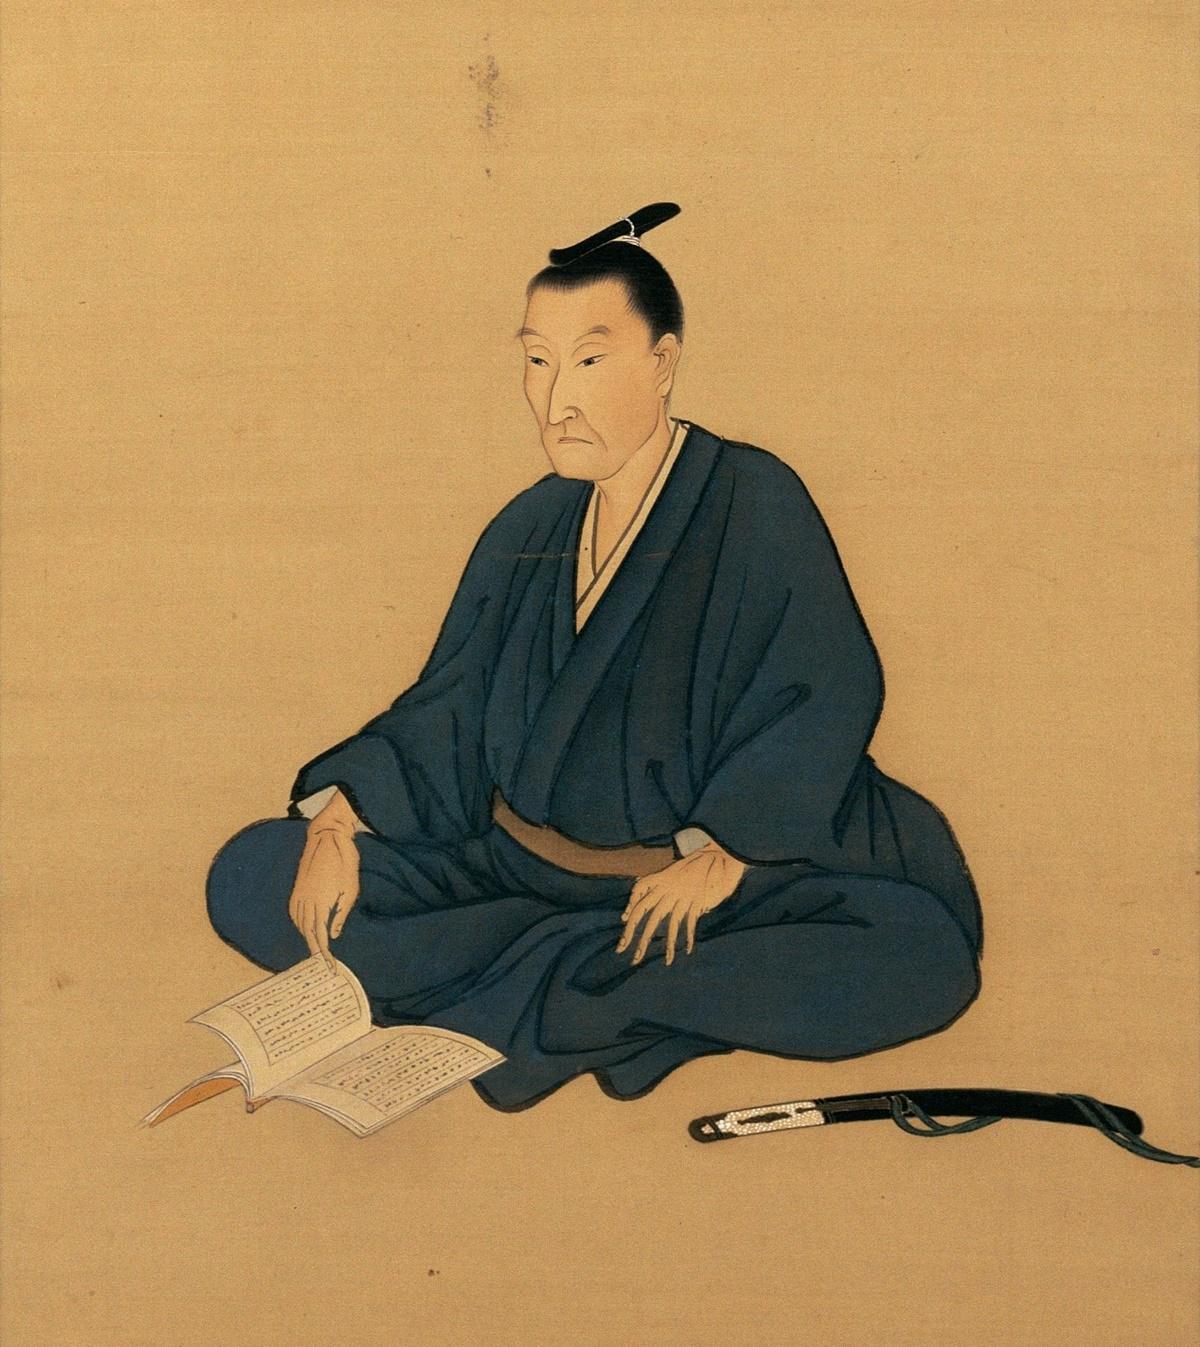 Yoshida_Shoin 吉田松陰像(山口県文書館蔵)